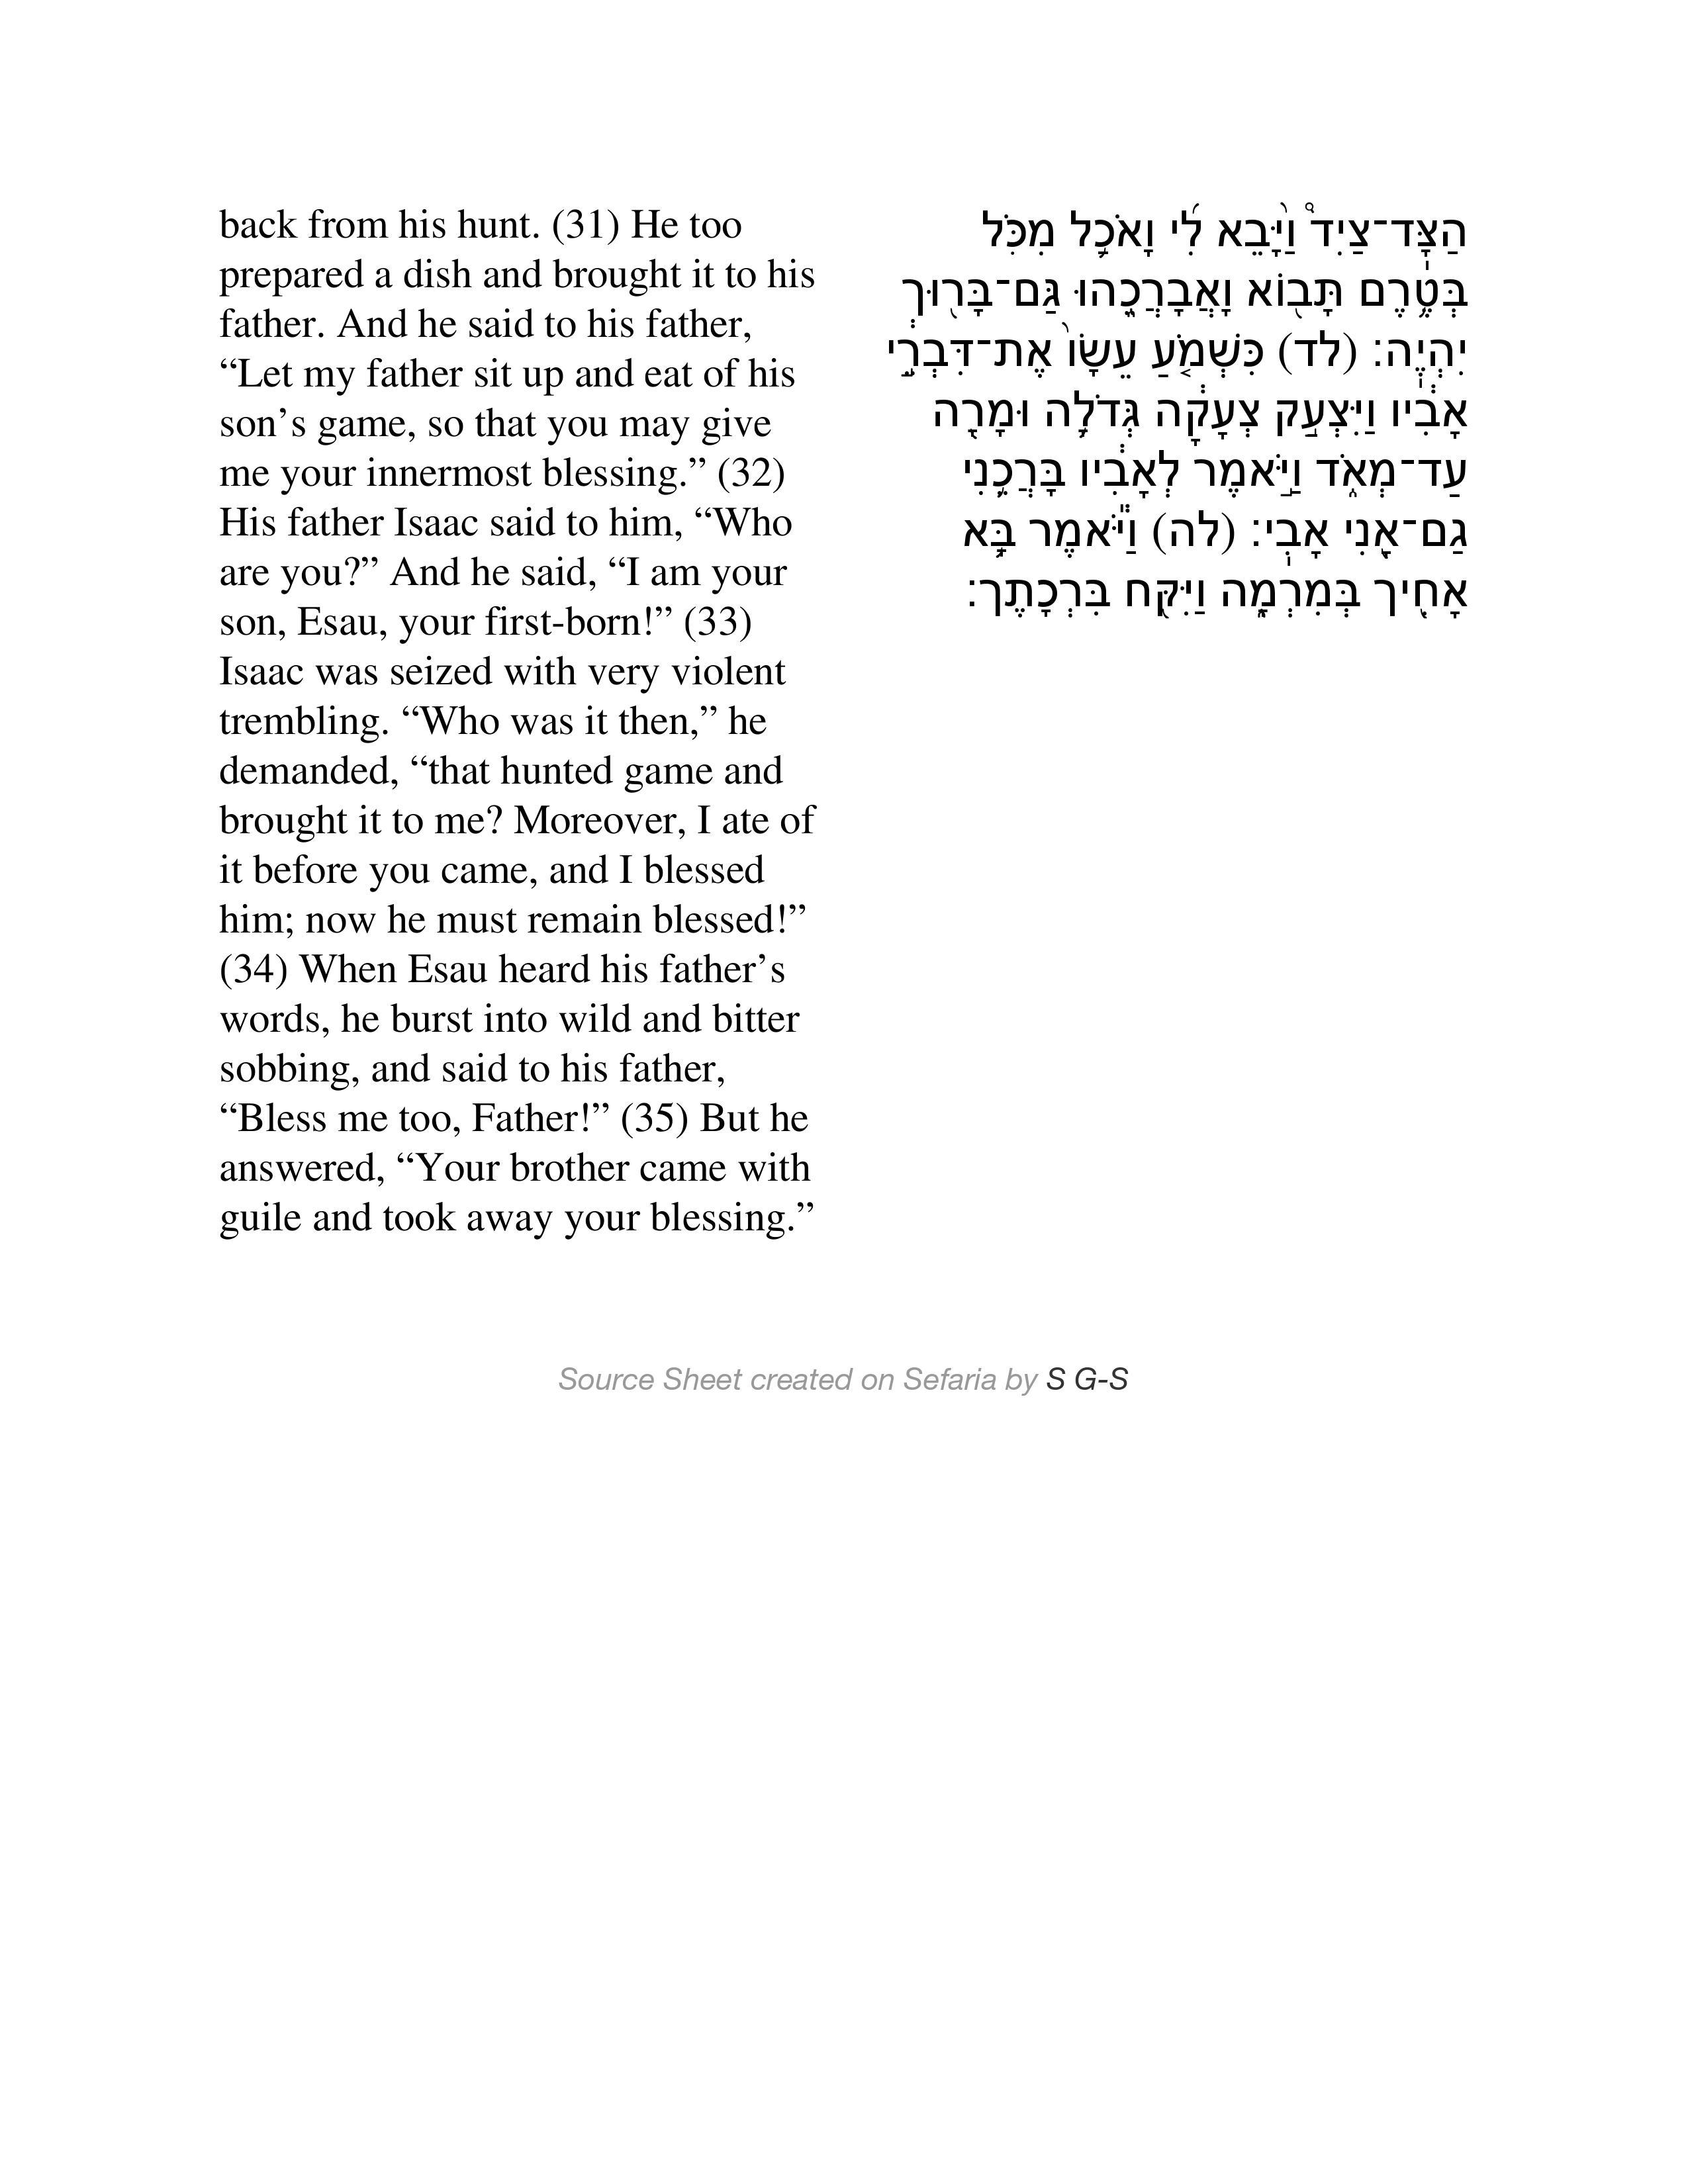 Isaac, Jacob, and Esau 4